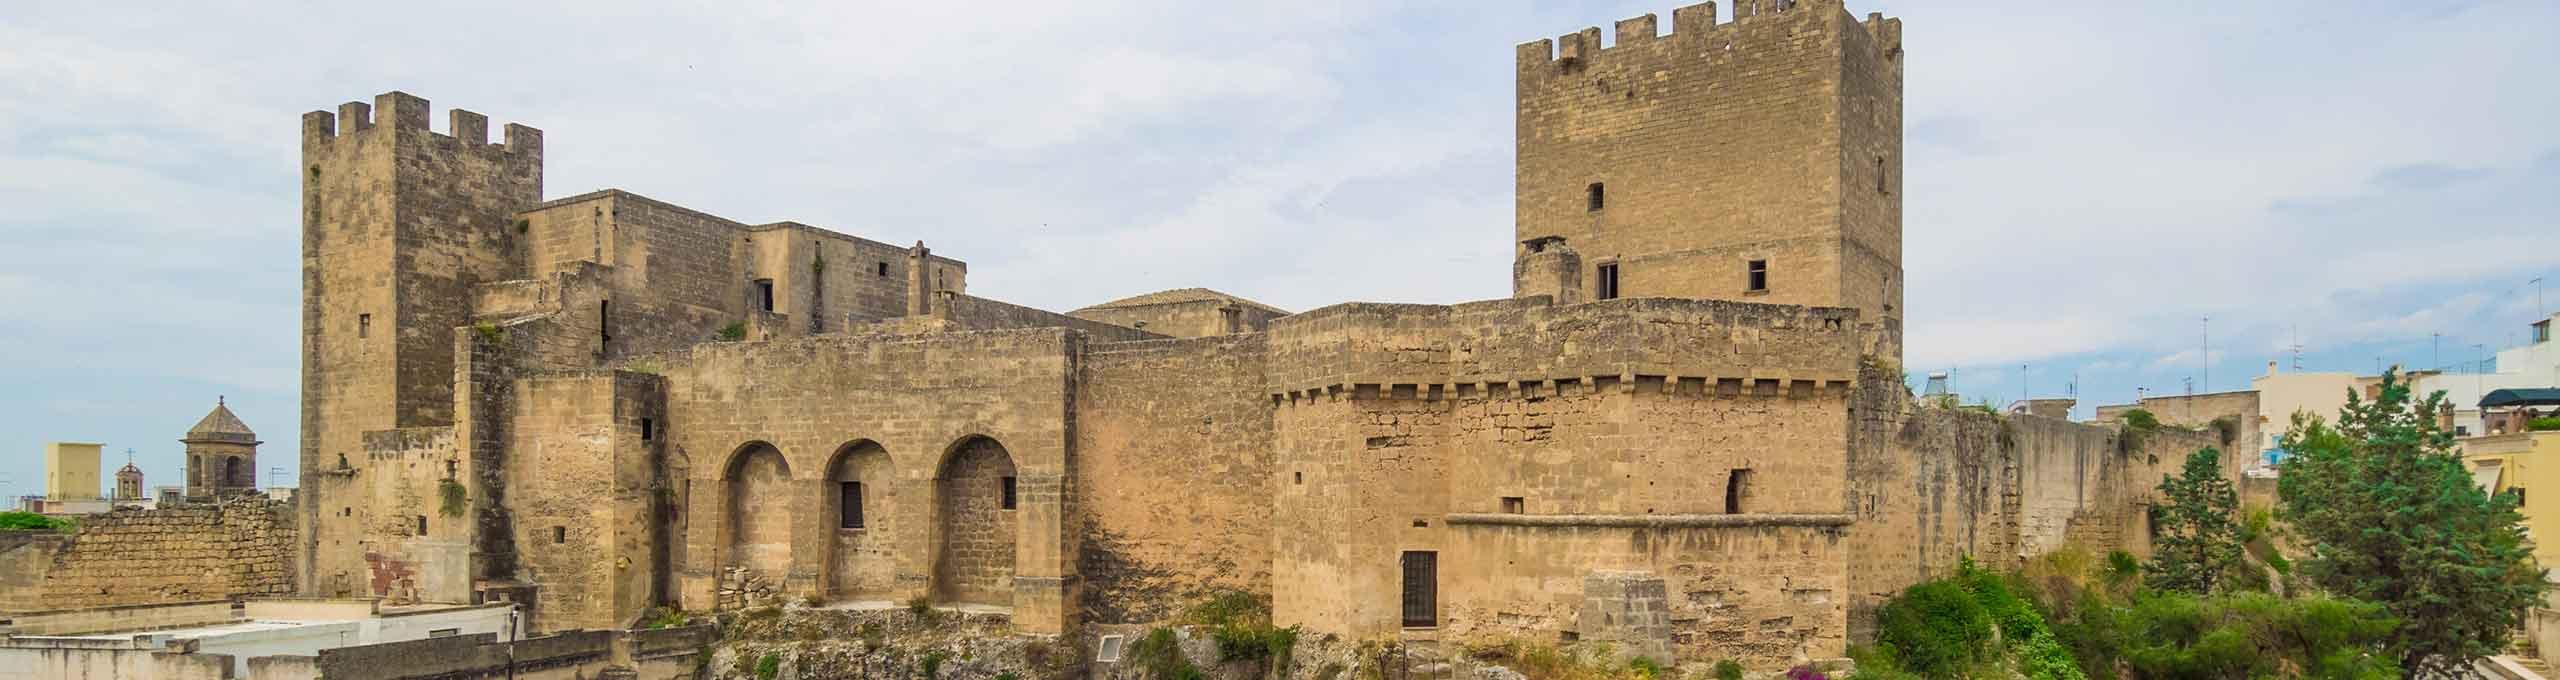 Grottaglie, Arco Ionico Tarantino